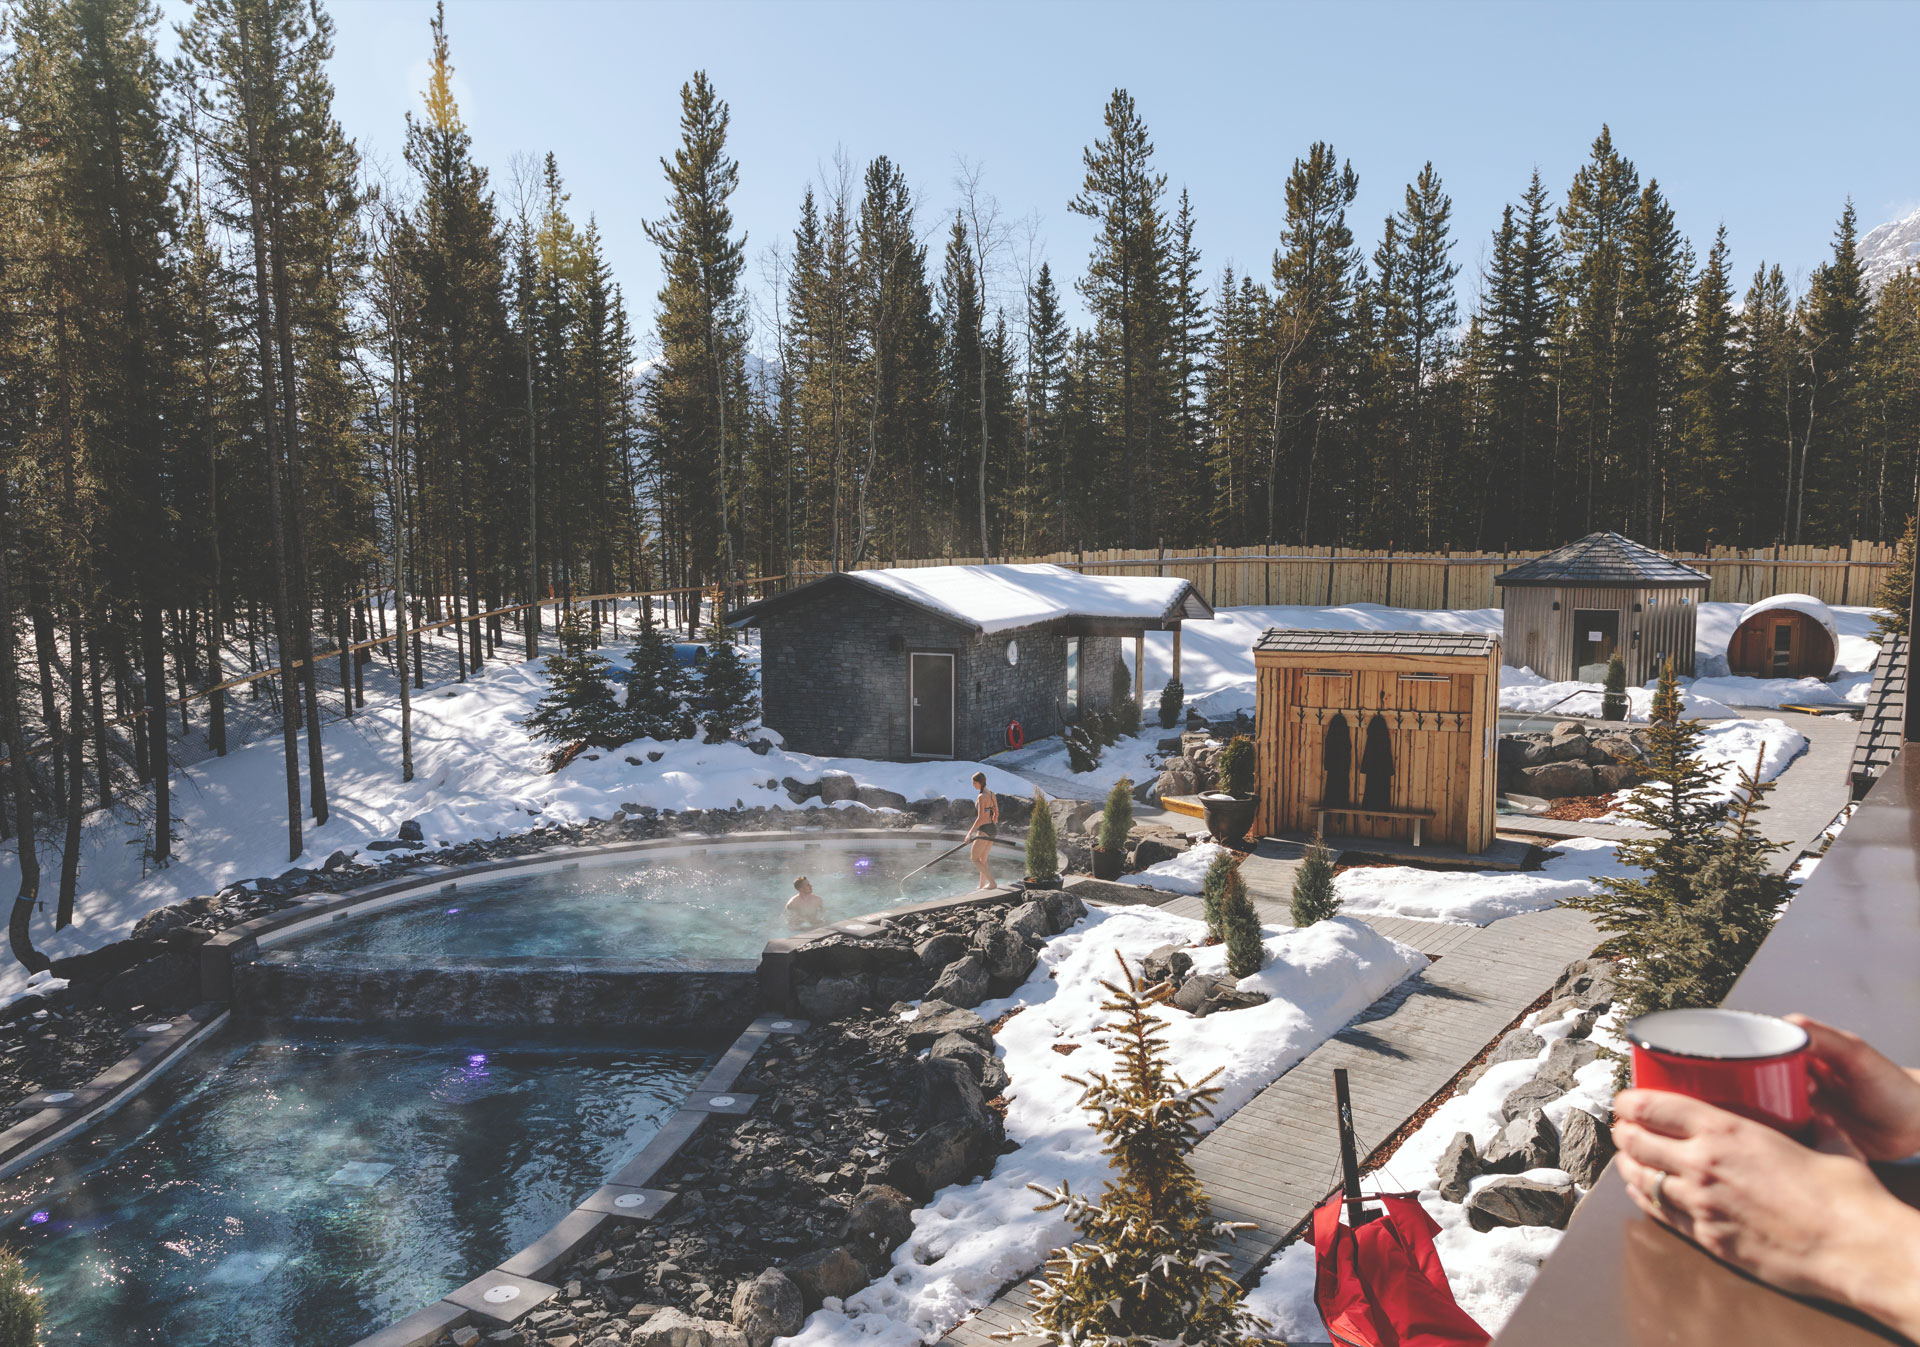 The Best Winter Road Trips 1